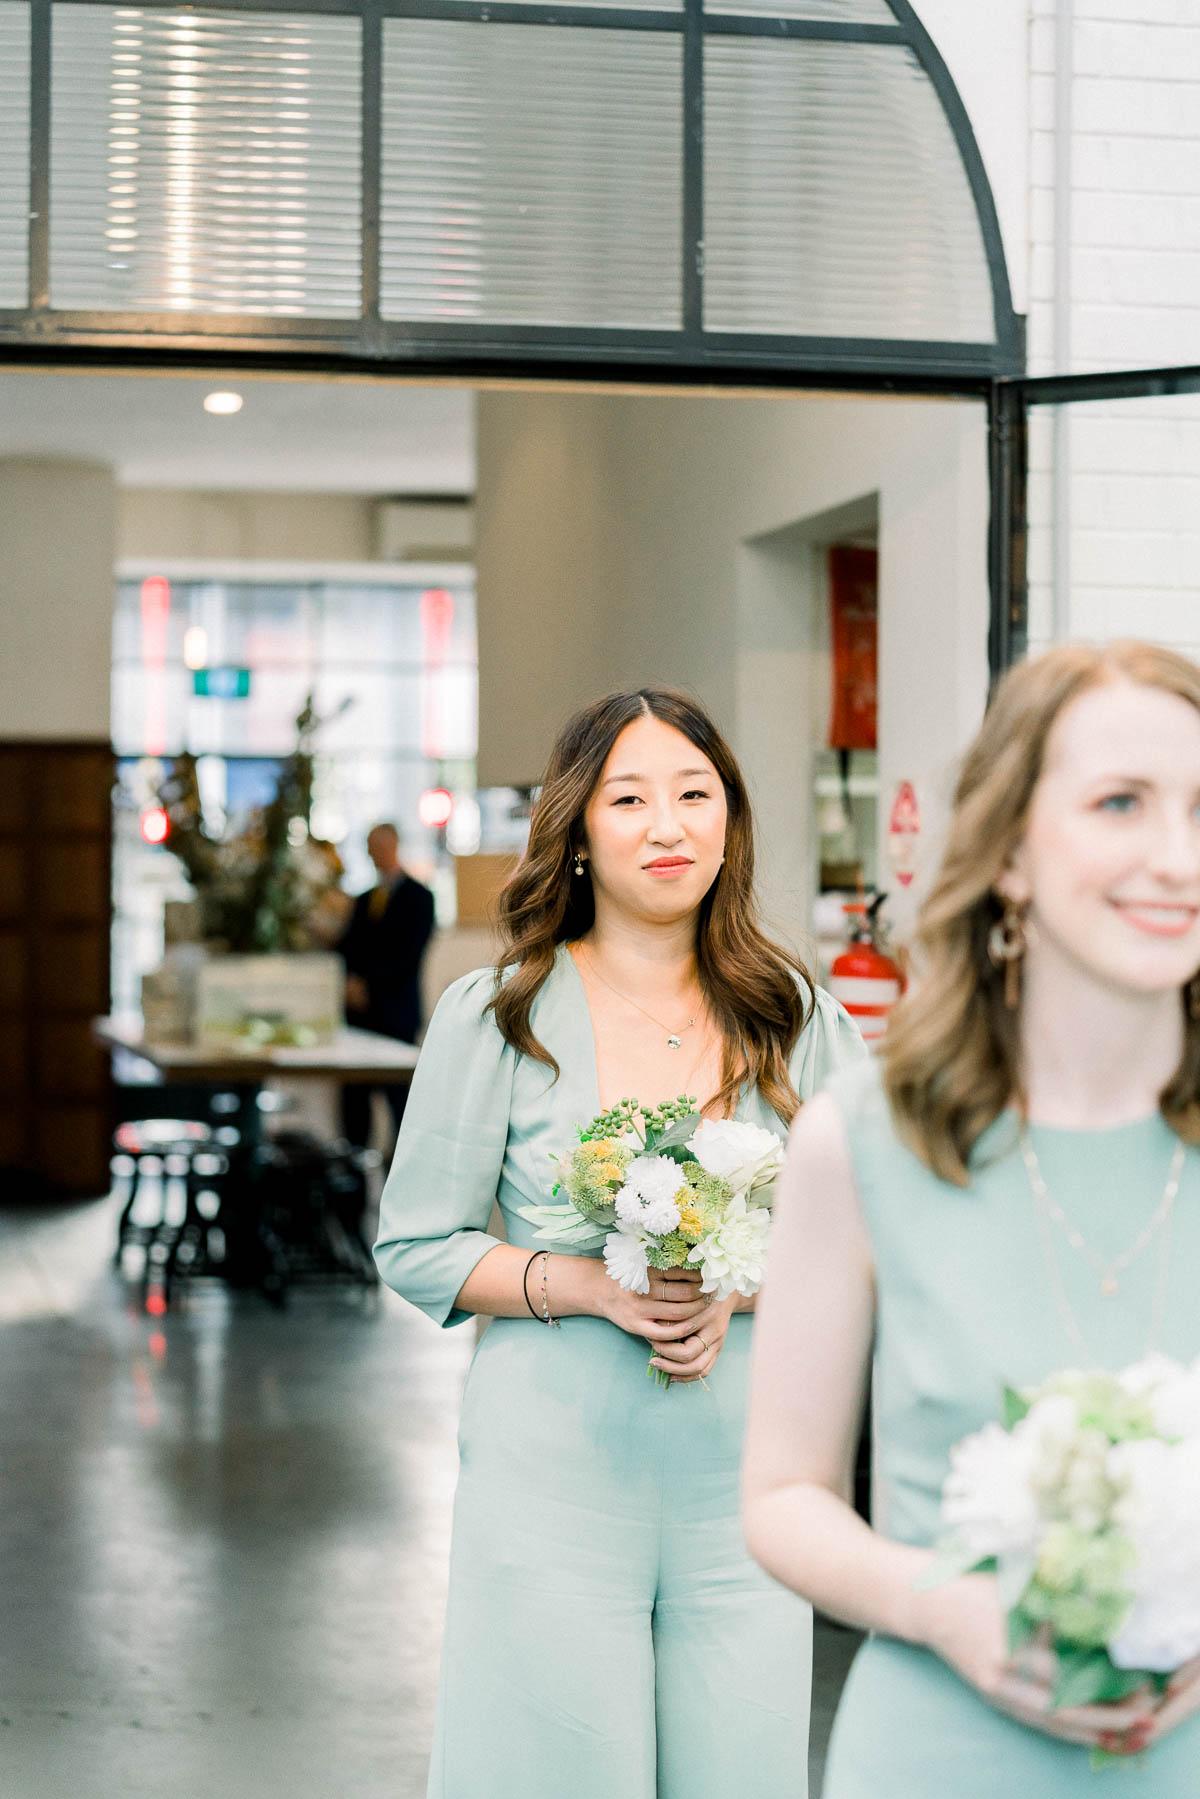 little-henri-cafe-wedding-thornbury-heart+soul-weddings-jane-aaron-05597.jpg